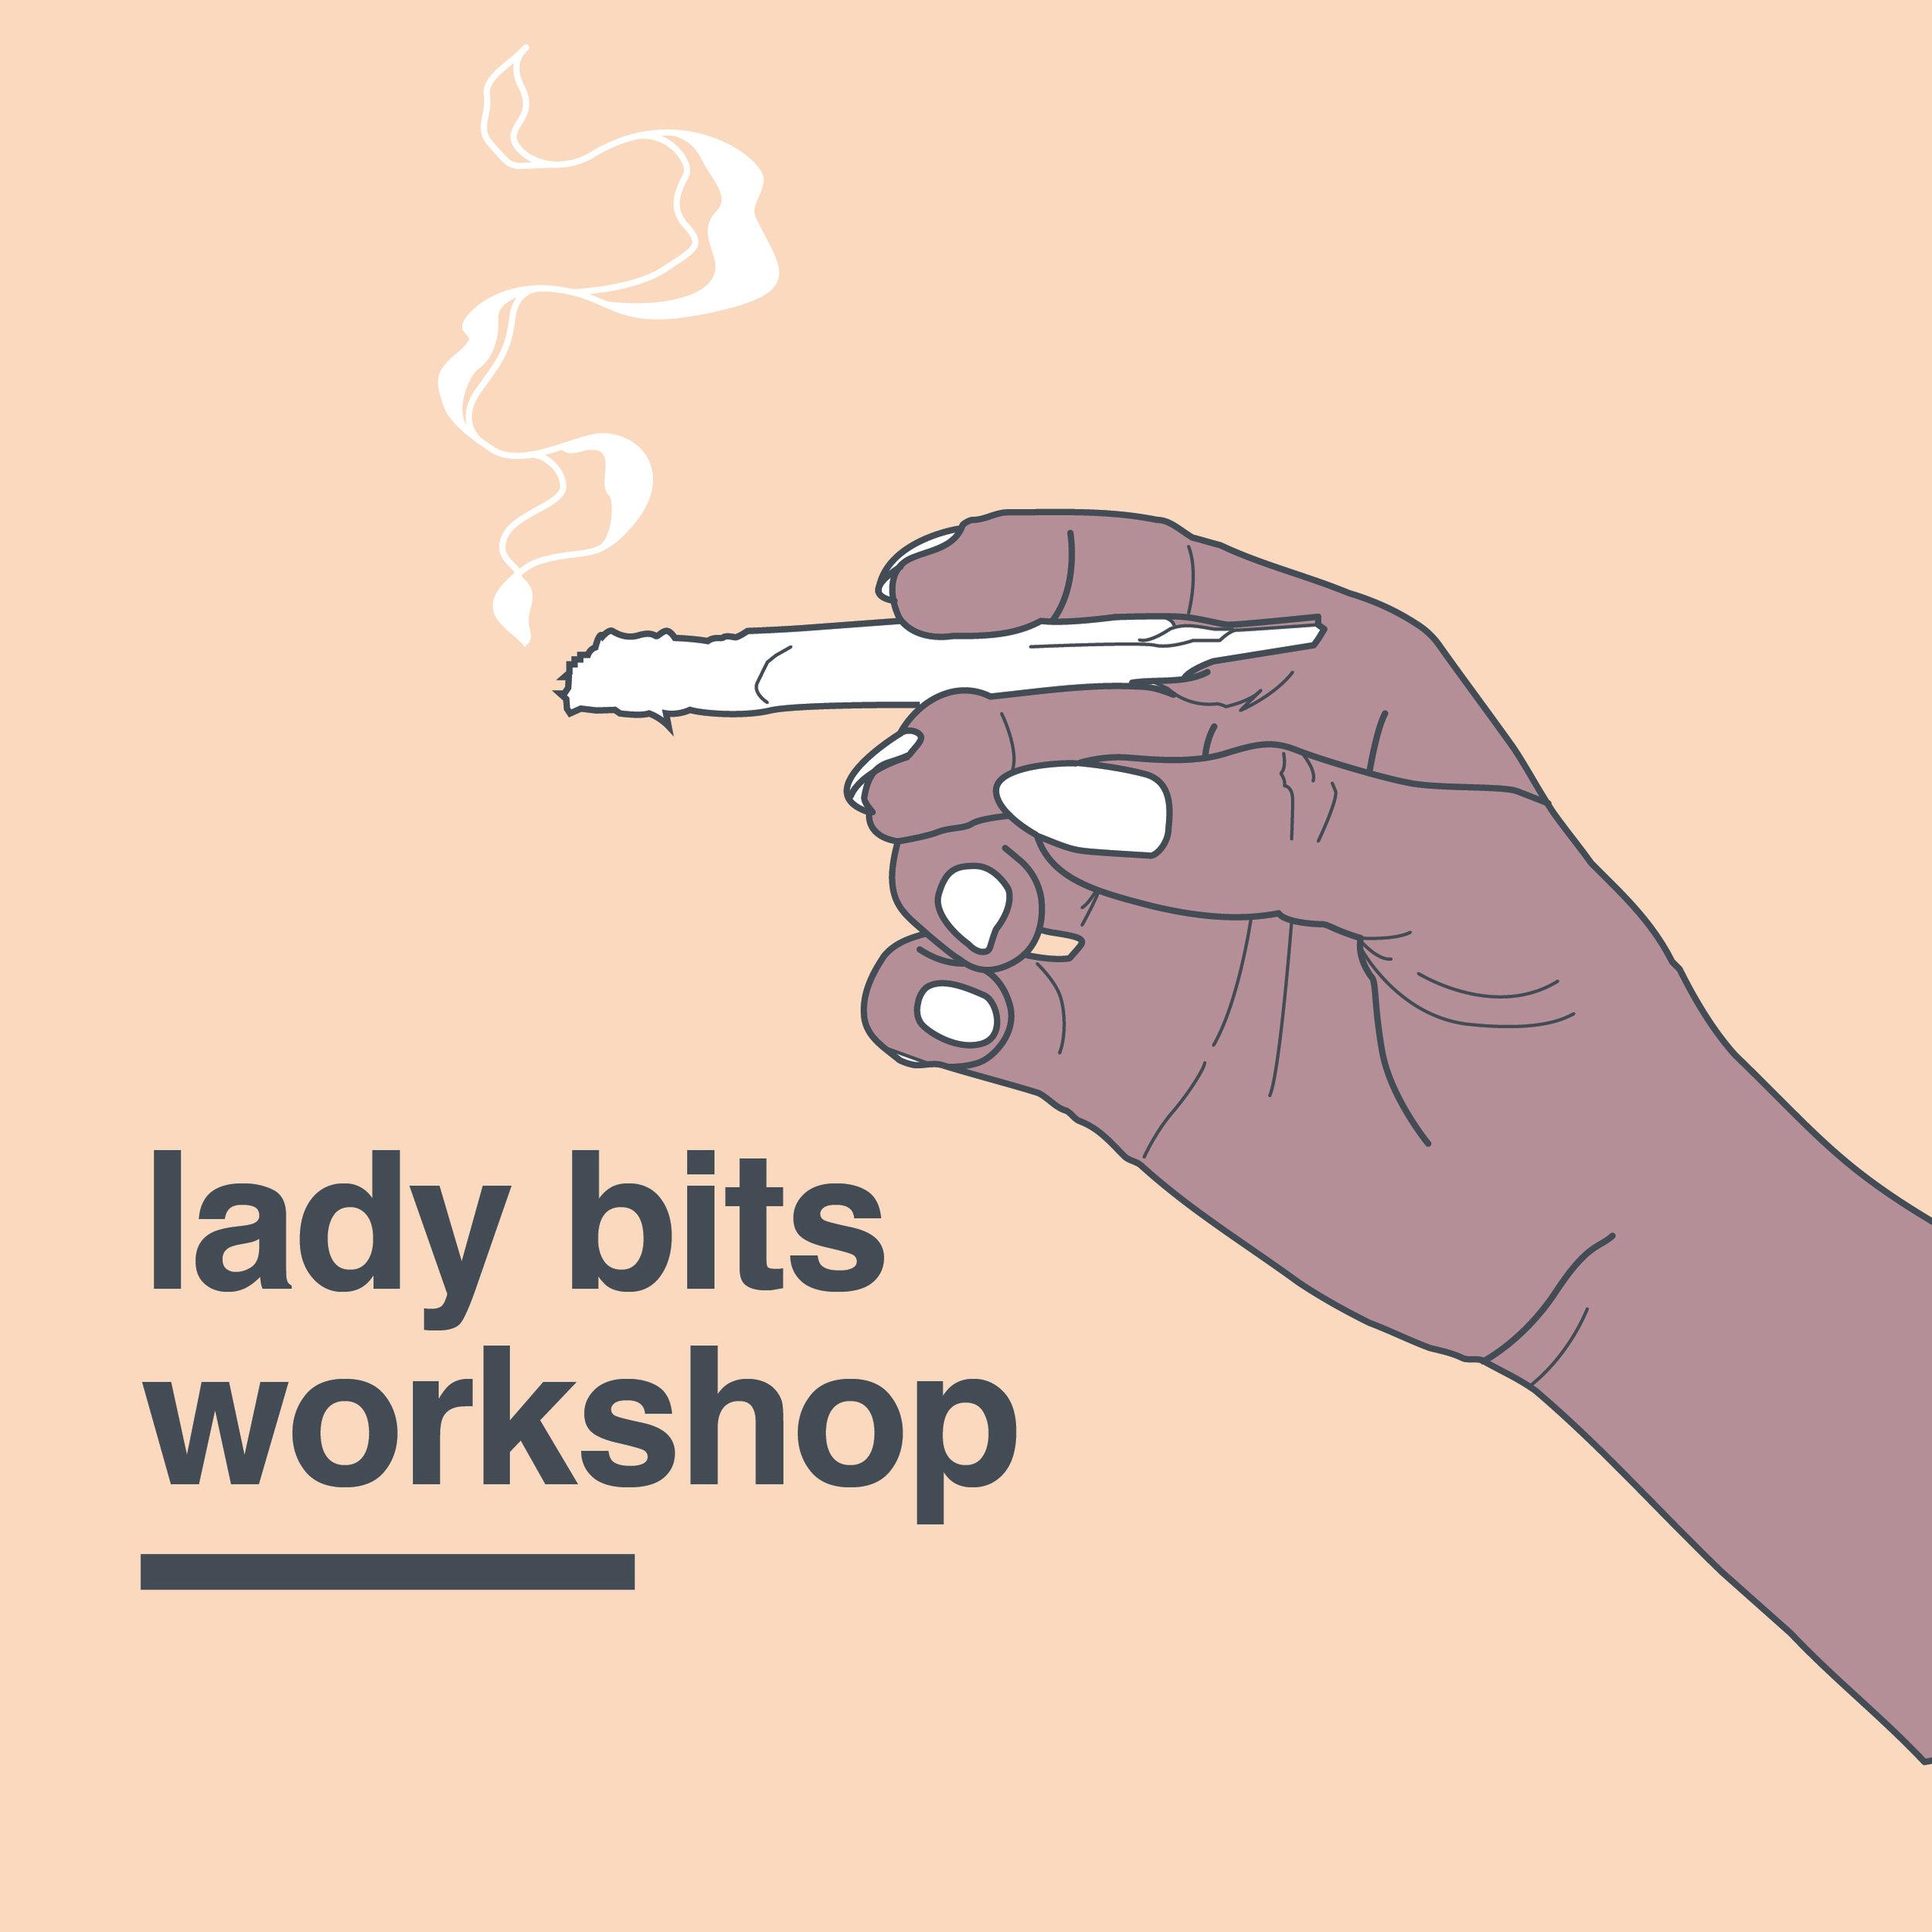 Ladybitsworkshop.jpg